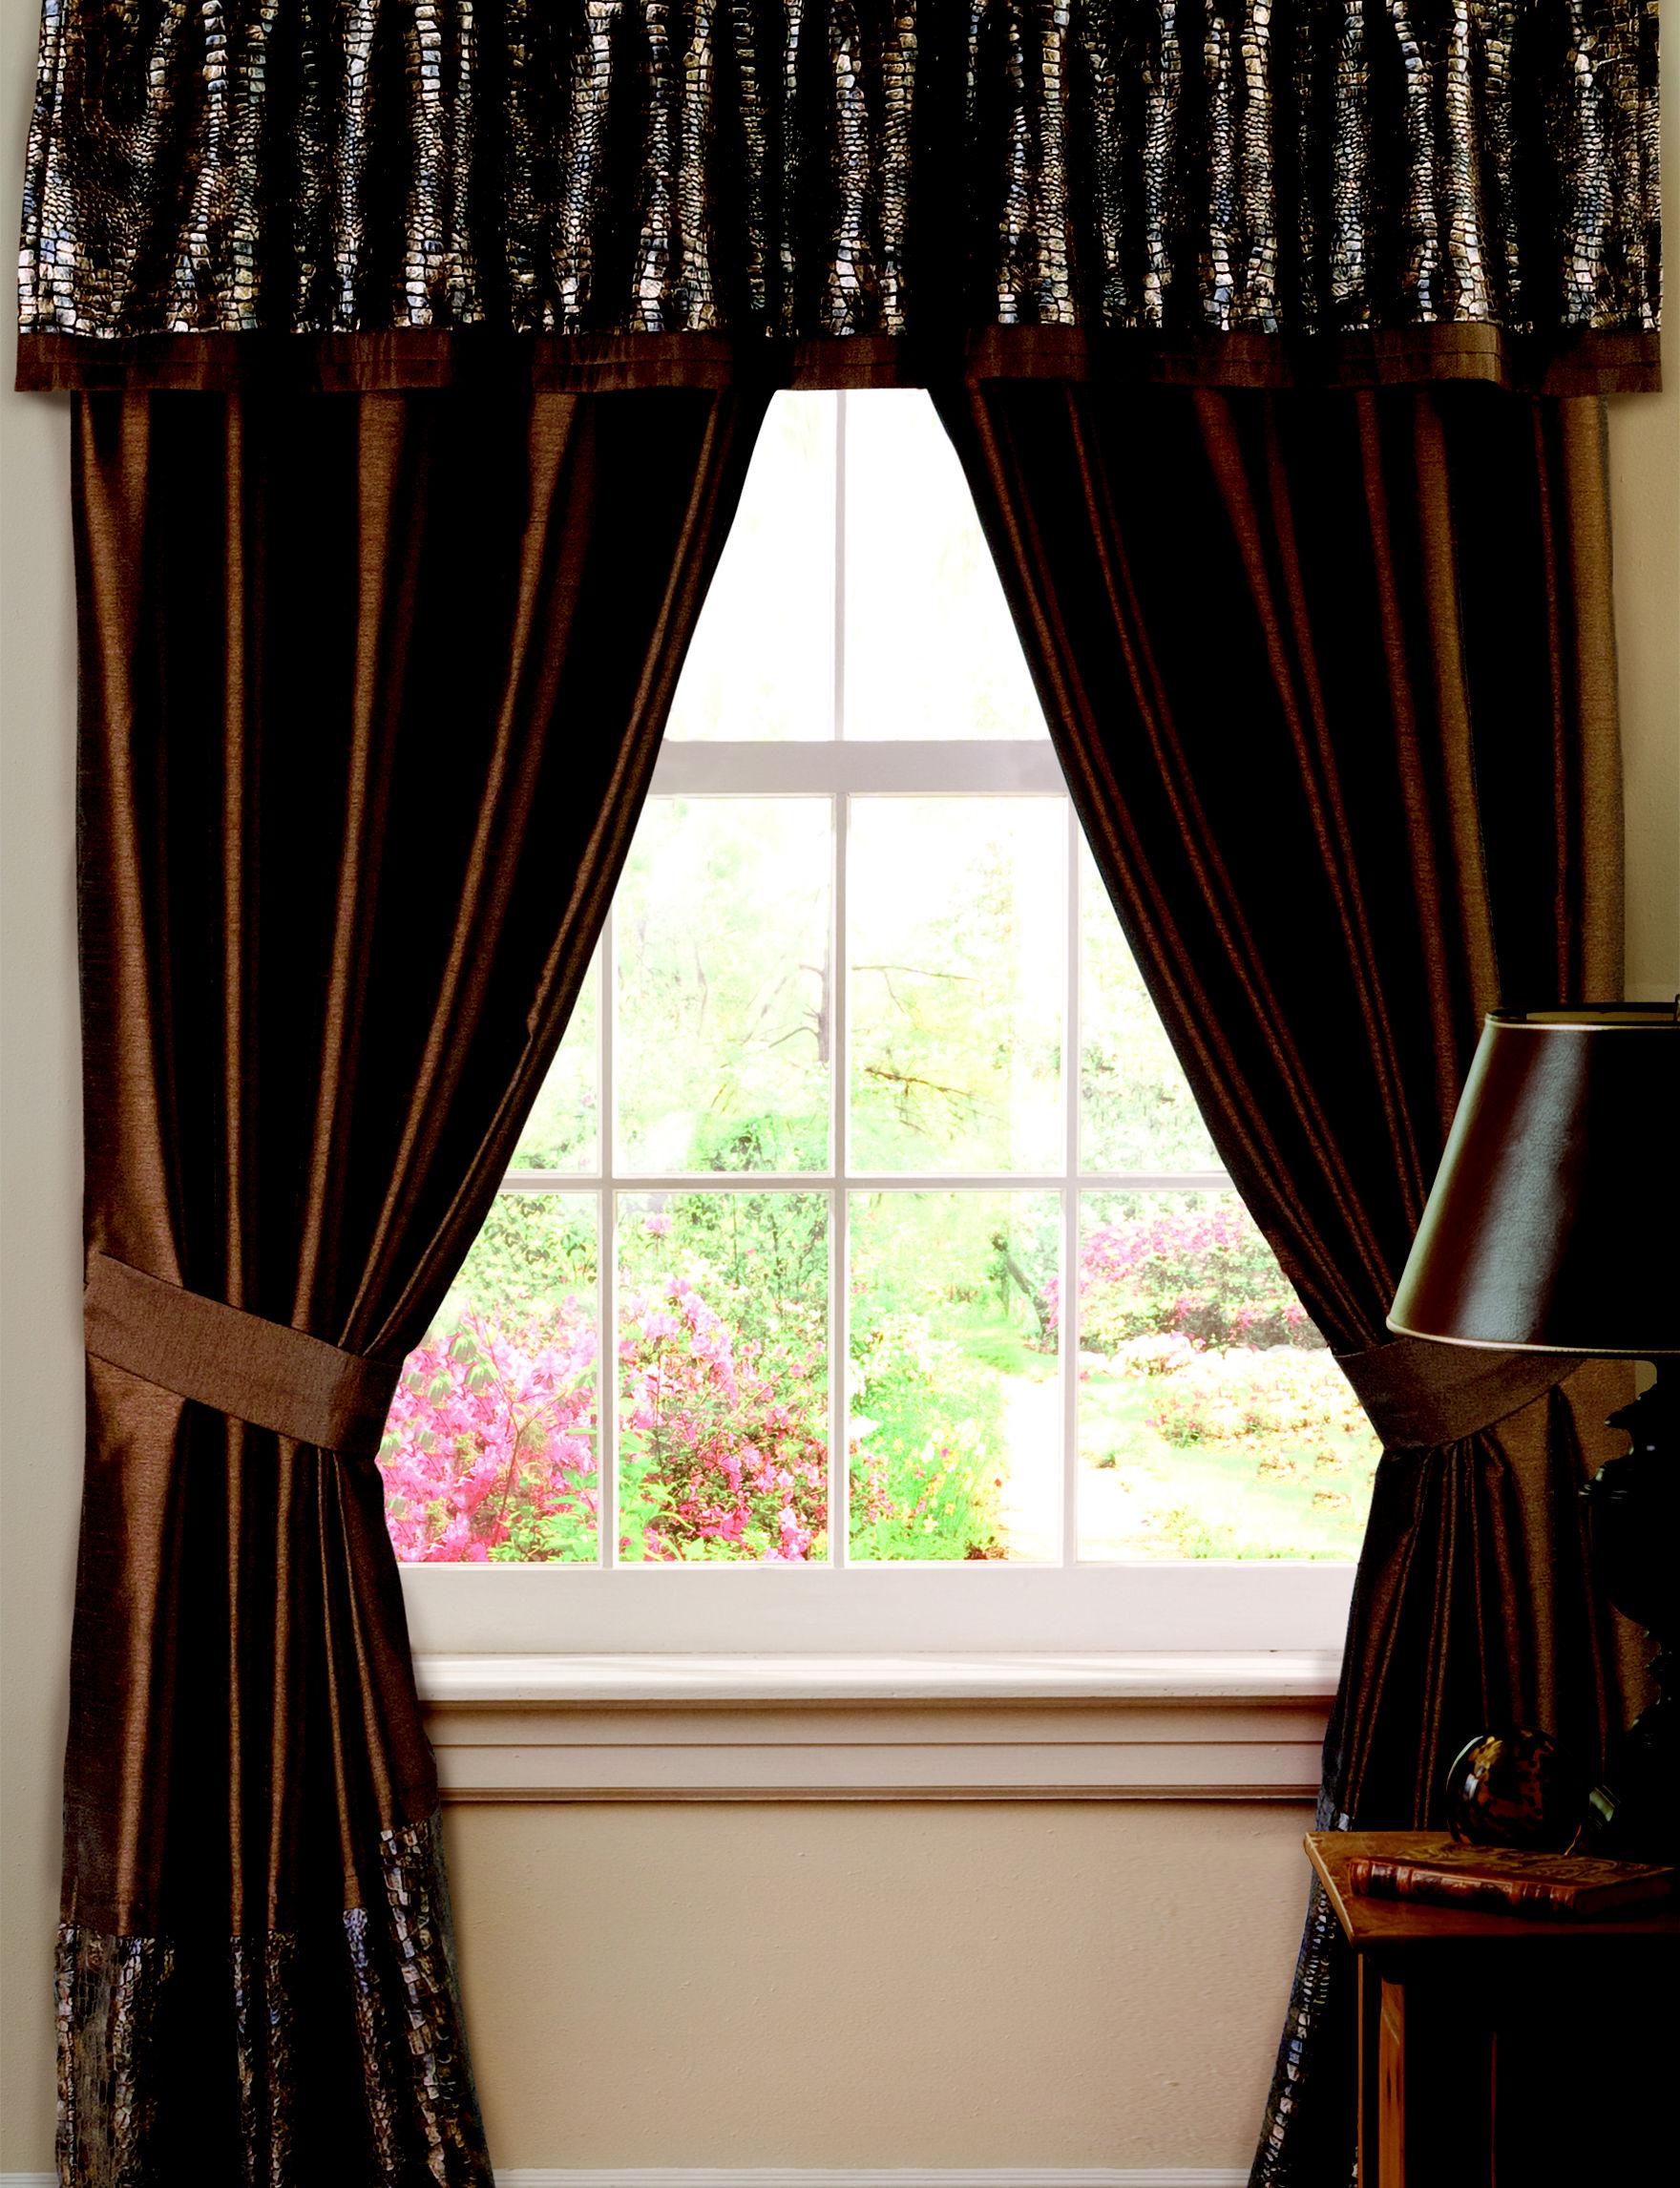 Lush Decor Brown Curtains & Drapes Window Treatments